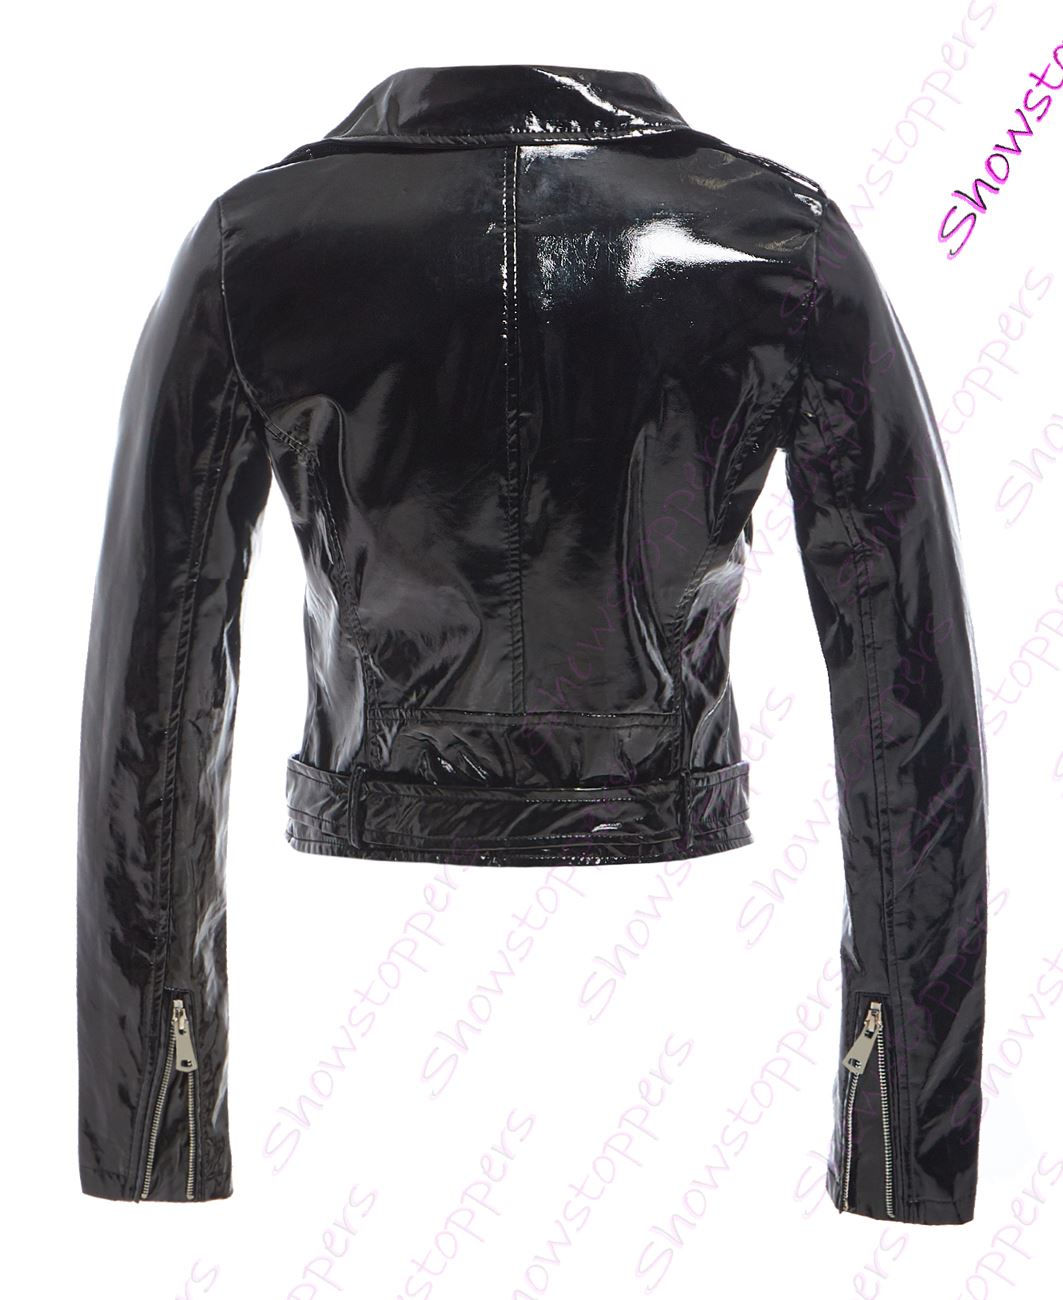 Womens-Patent-Biker-Jacket-Ladies-Size-8-10-12-14-16-PU-Black-Pink-New thumbnail 3